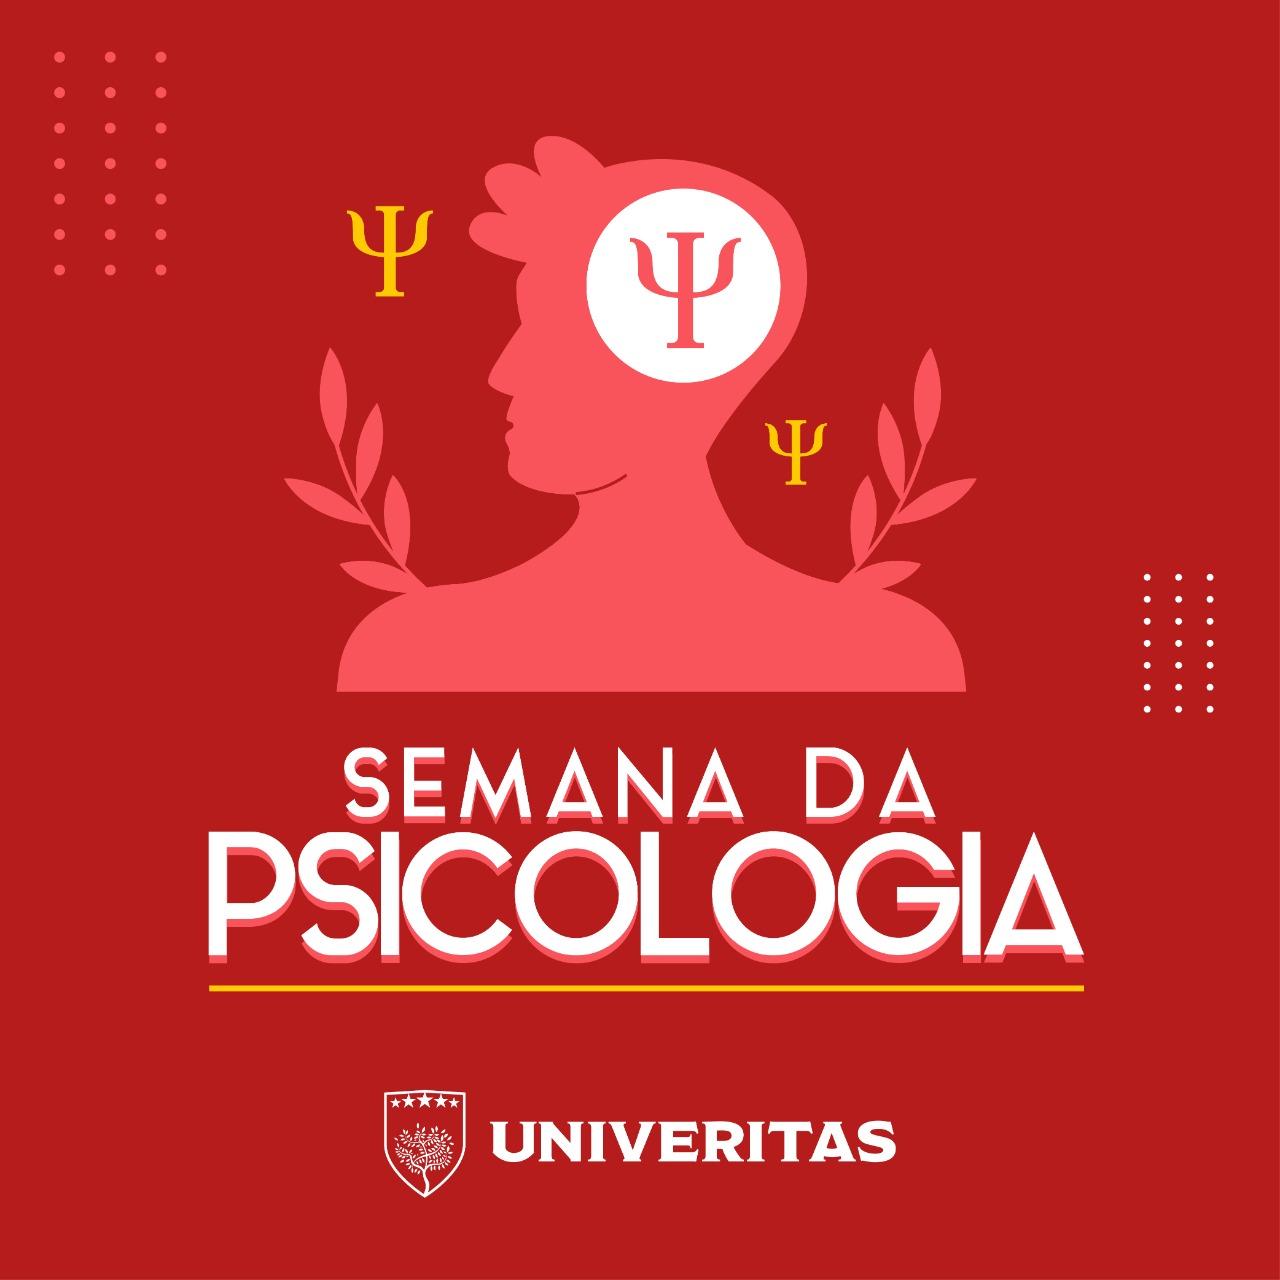 Univeritas Semana de Psicologia